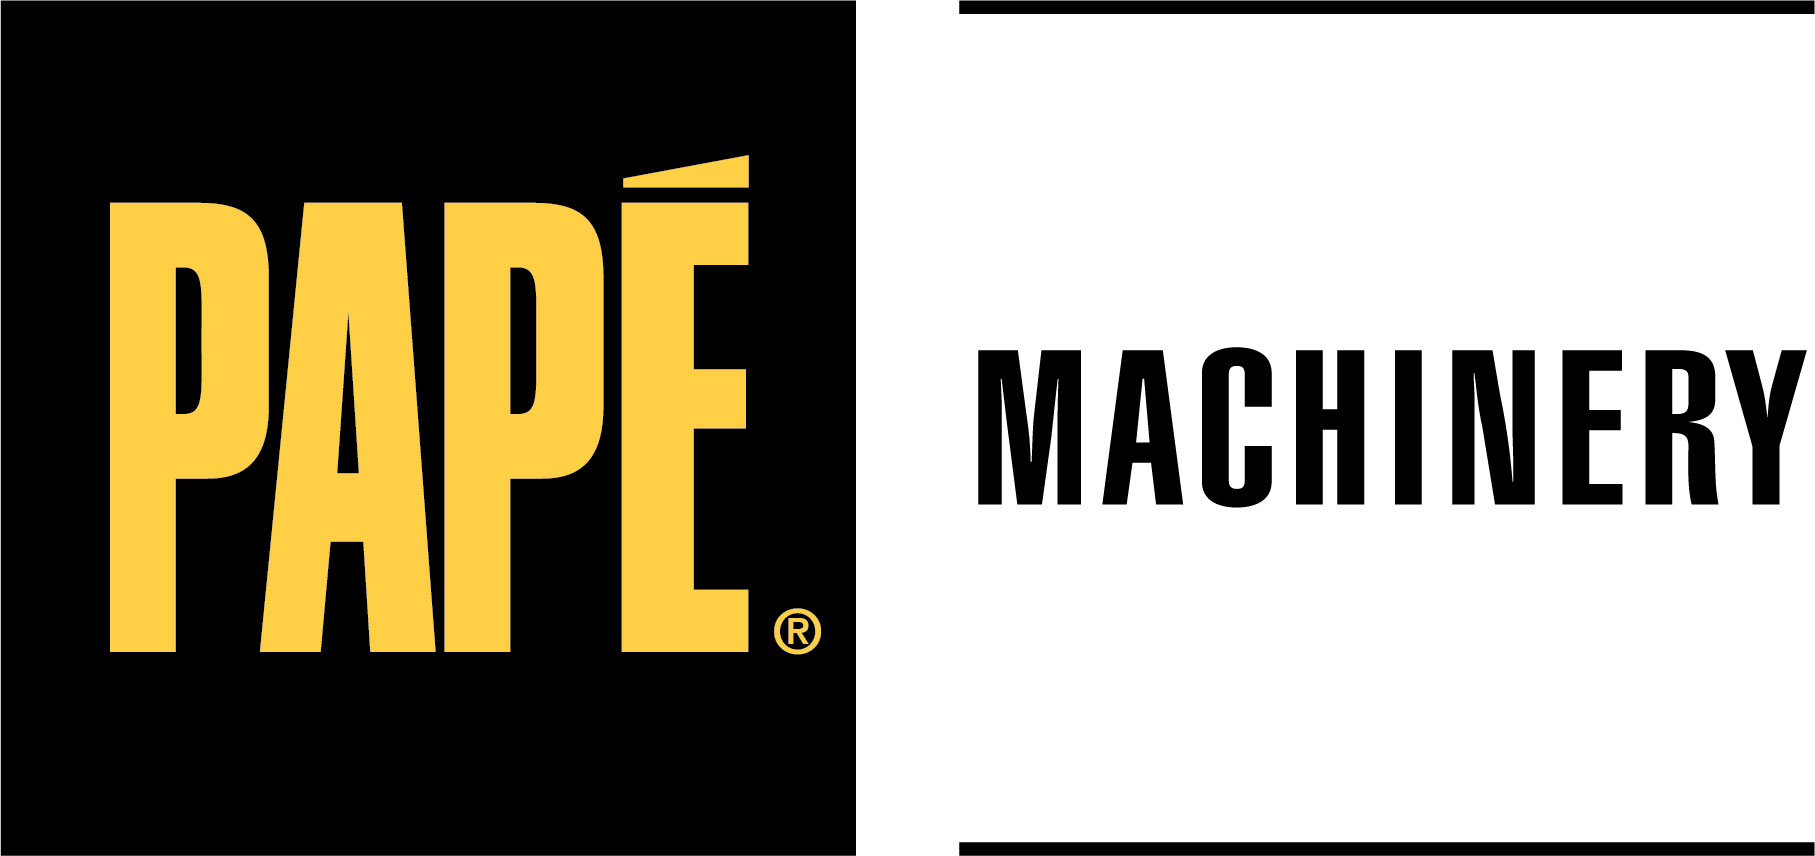 Pape Machinery company logo